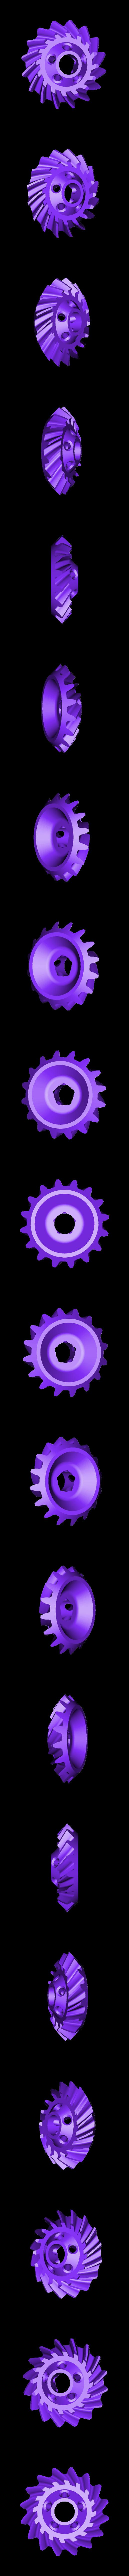 Planet Gear Qty-2.STL Download free STL file Epicyclic Bevel Gear Toy • 3D printer design, montuparmar1